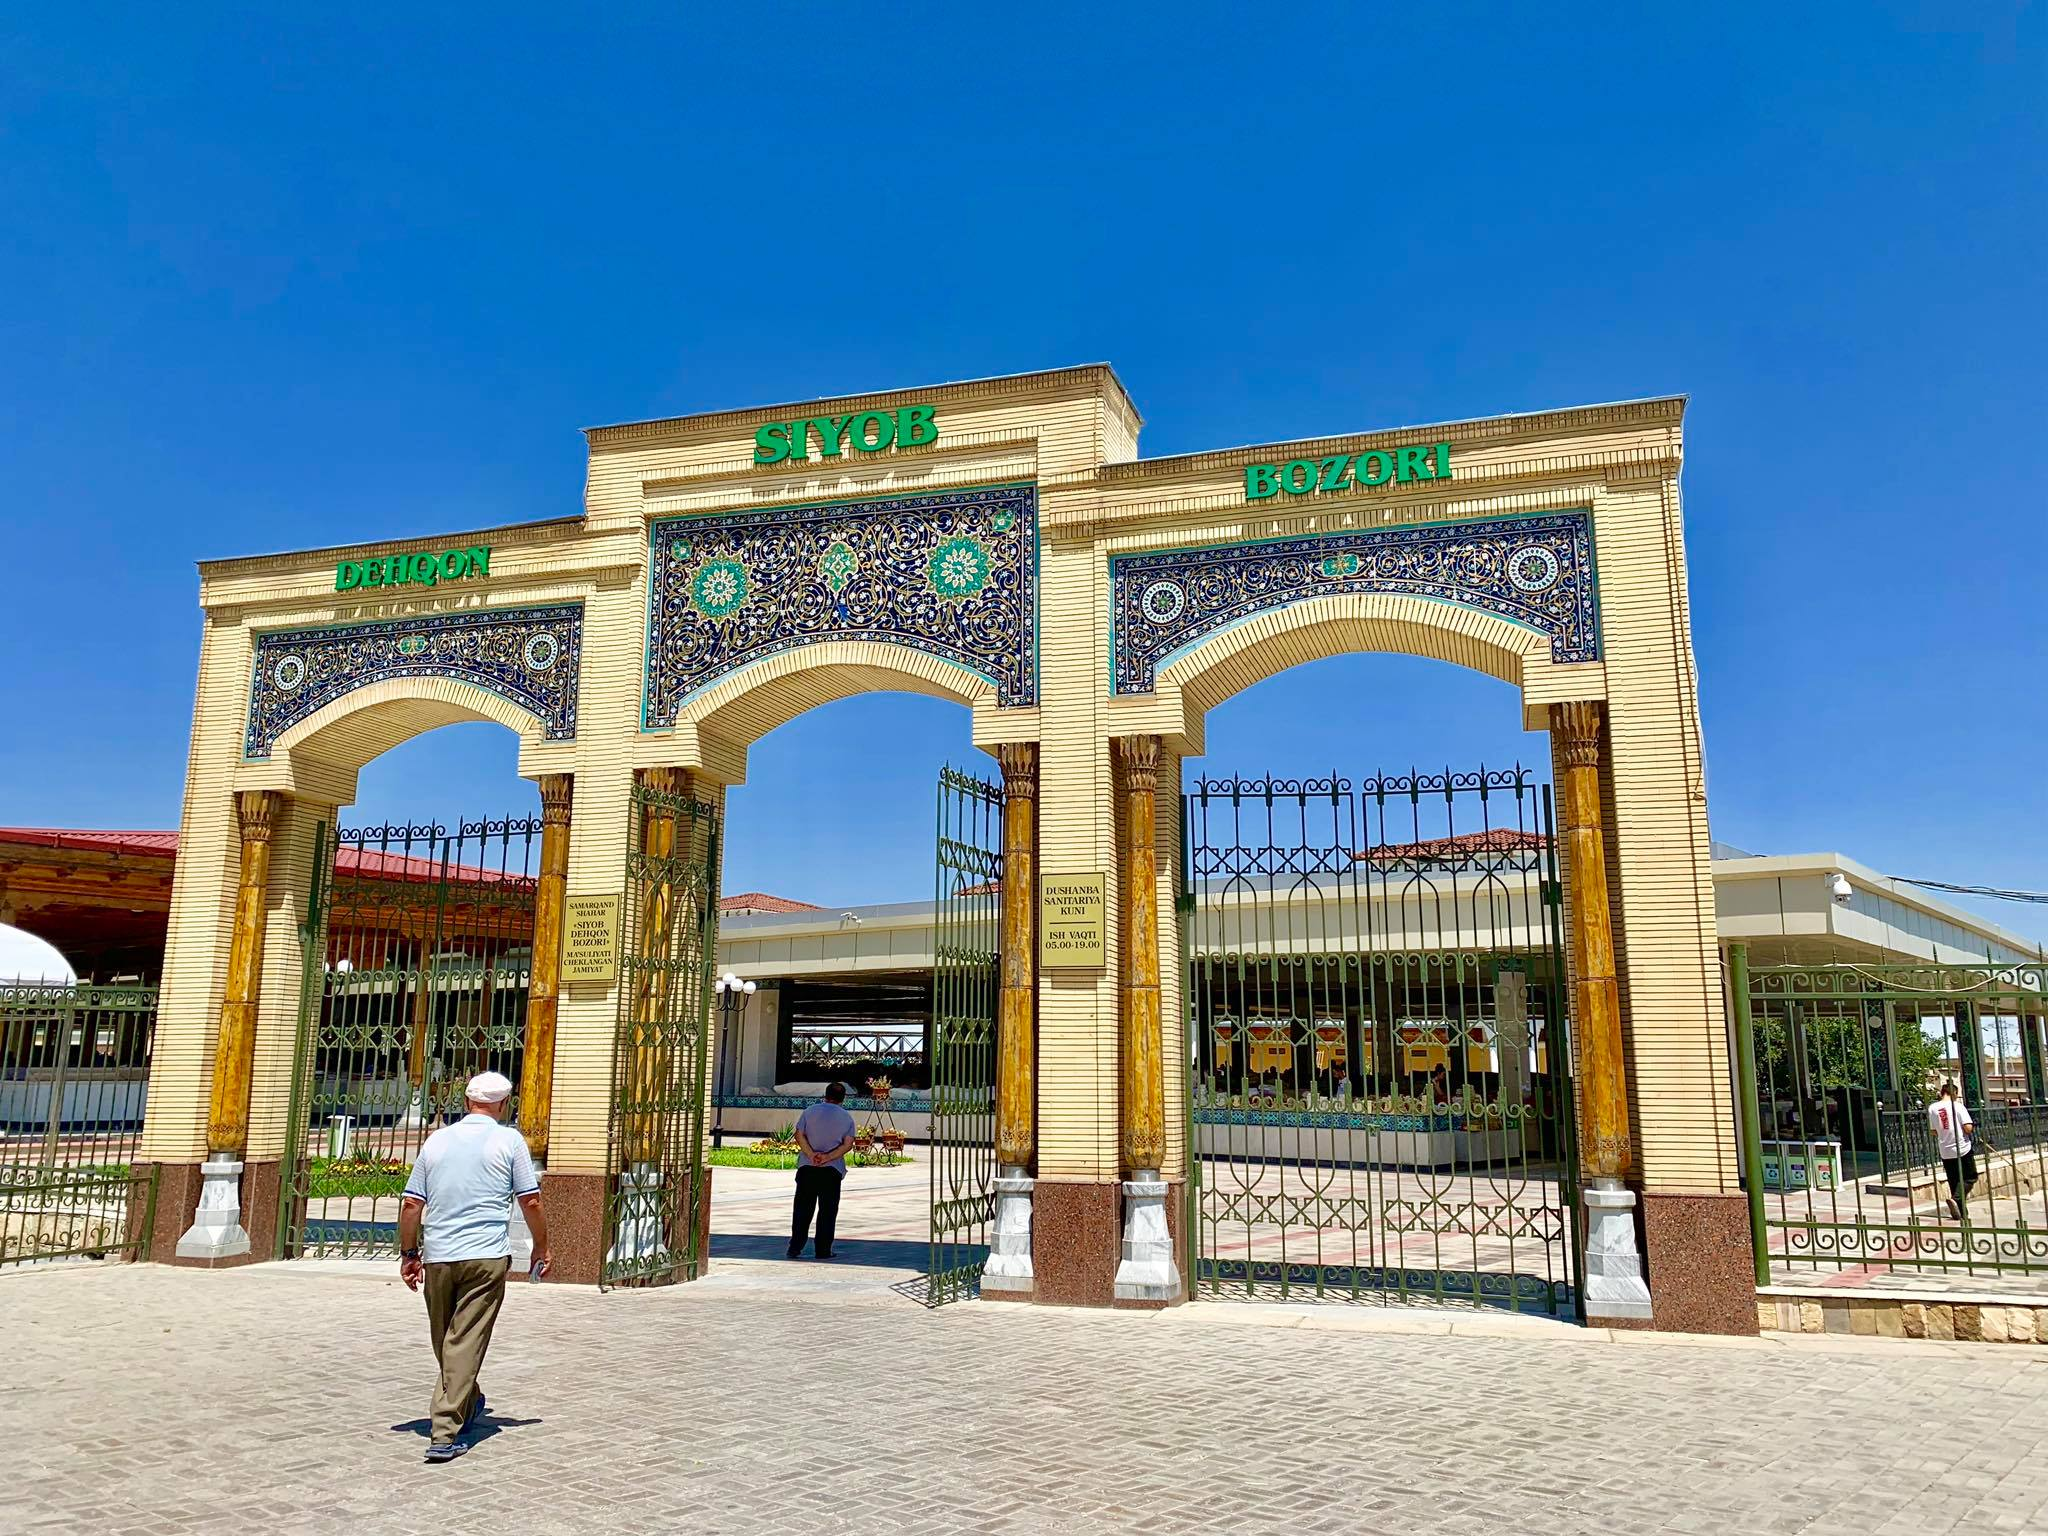 Kach Solo Travels in 2019 Siyab Bazaar and Registan on my first day in Samarkand6.jpg